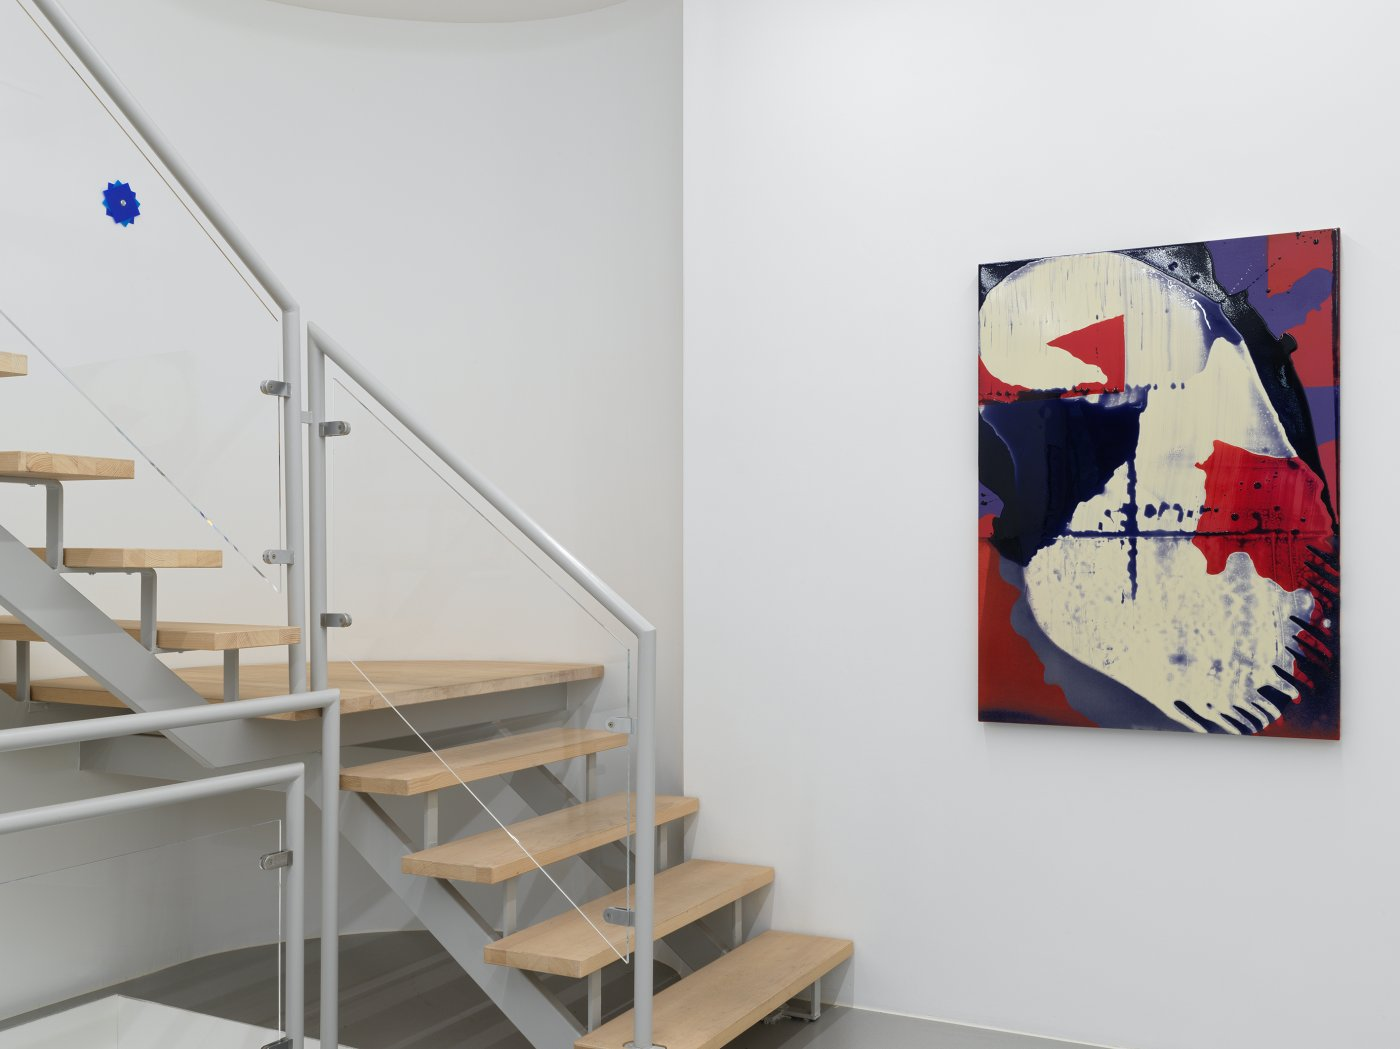 Galerie Eva Presenhuber All in One 4